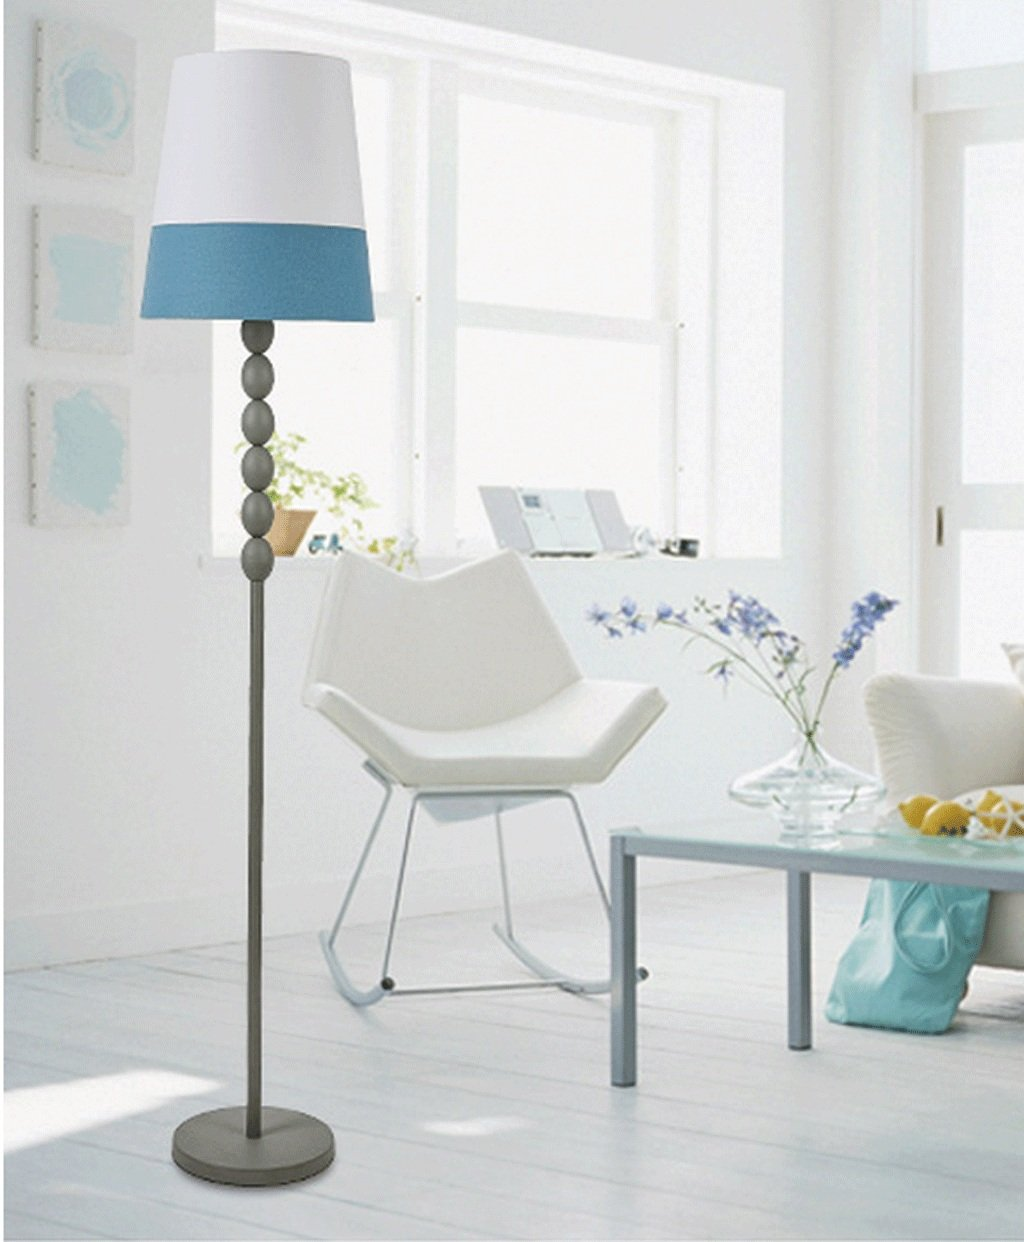 JCRNJSB® フロアランプリビングルームライトベッドルームベッドサイドランプ現代ミニマルアメリカ照明ランプ(光源なし) 照らすために調光可能 ( 色 : #2 ) B07CBPZ3CZ #2 #2